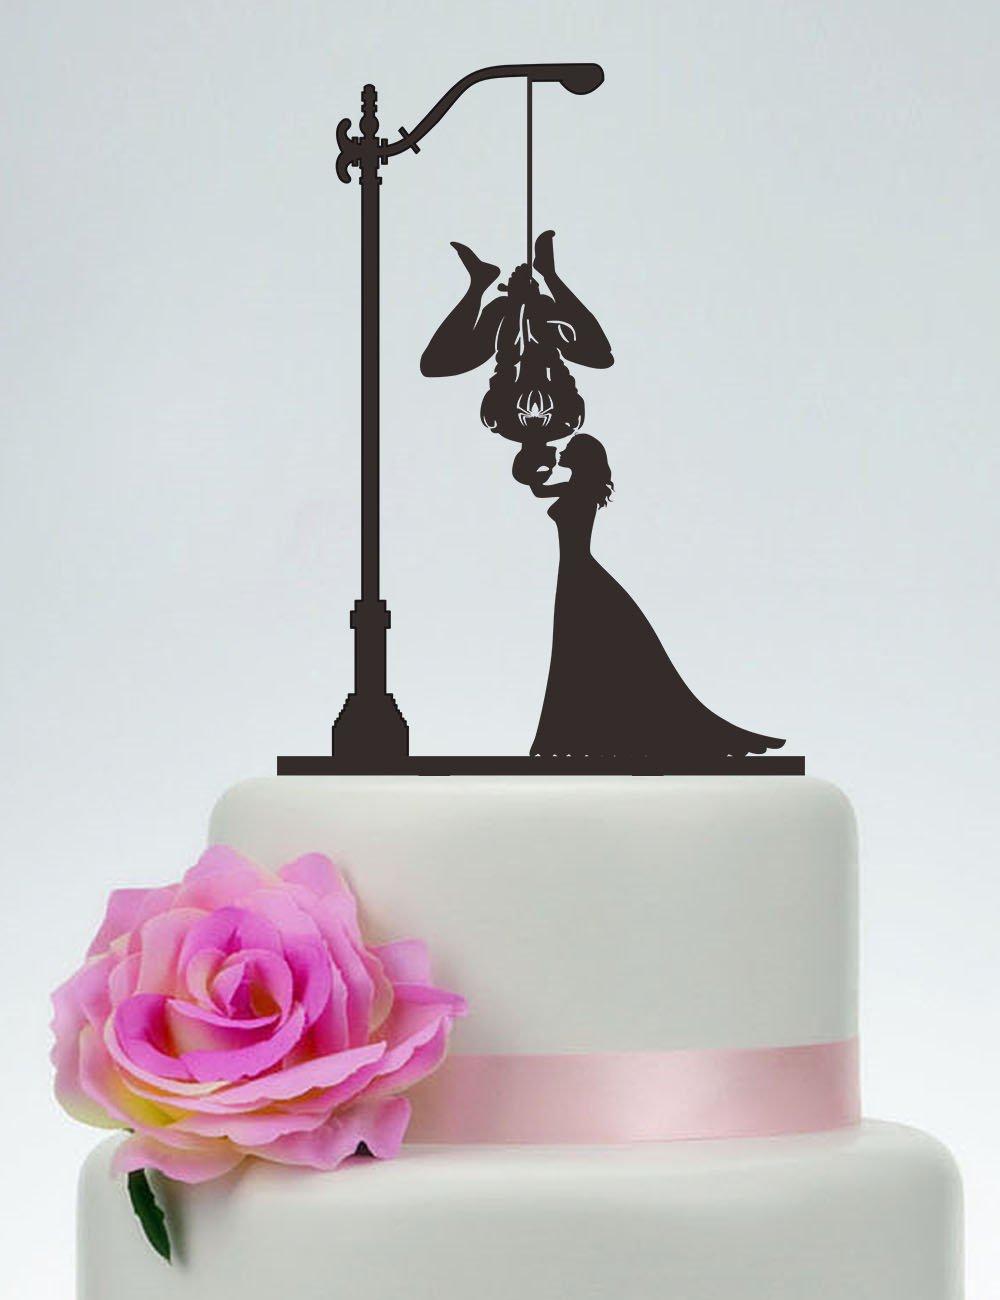 Spider-Man Cake Topper,Bride And Spider-Man Silhouette,Wedding Cake Topper,Couple Cake Topper,Kissing Cake Topper, Custom Cake Topper - P116